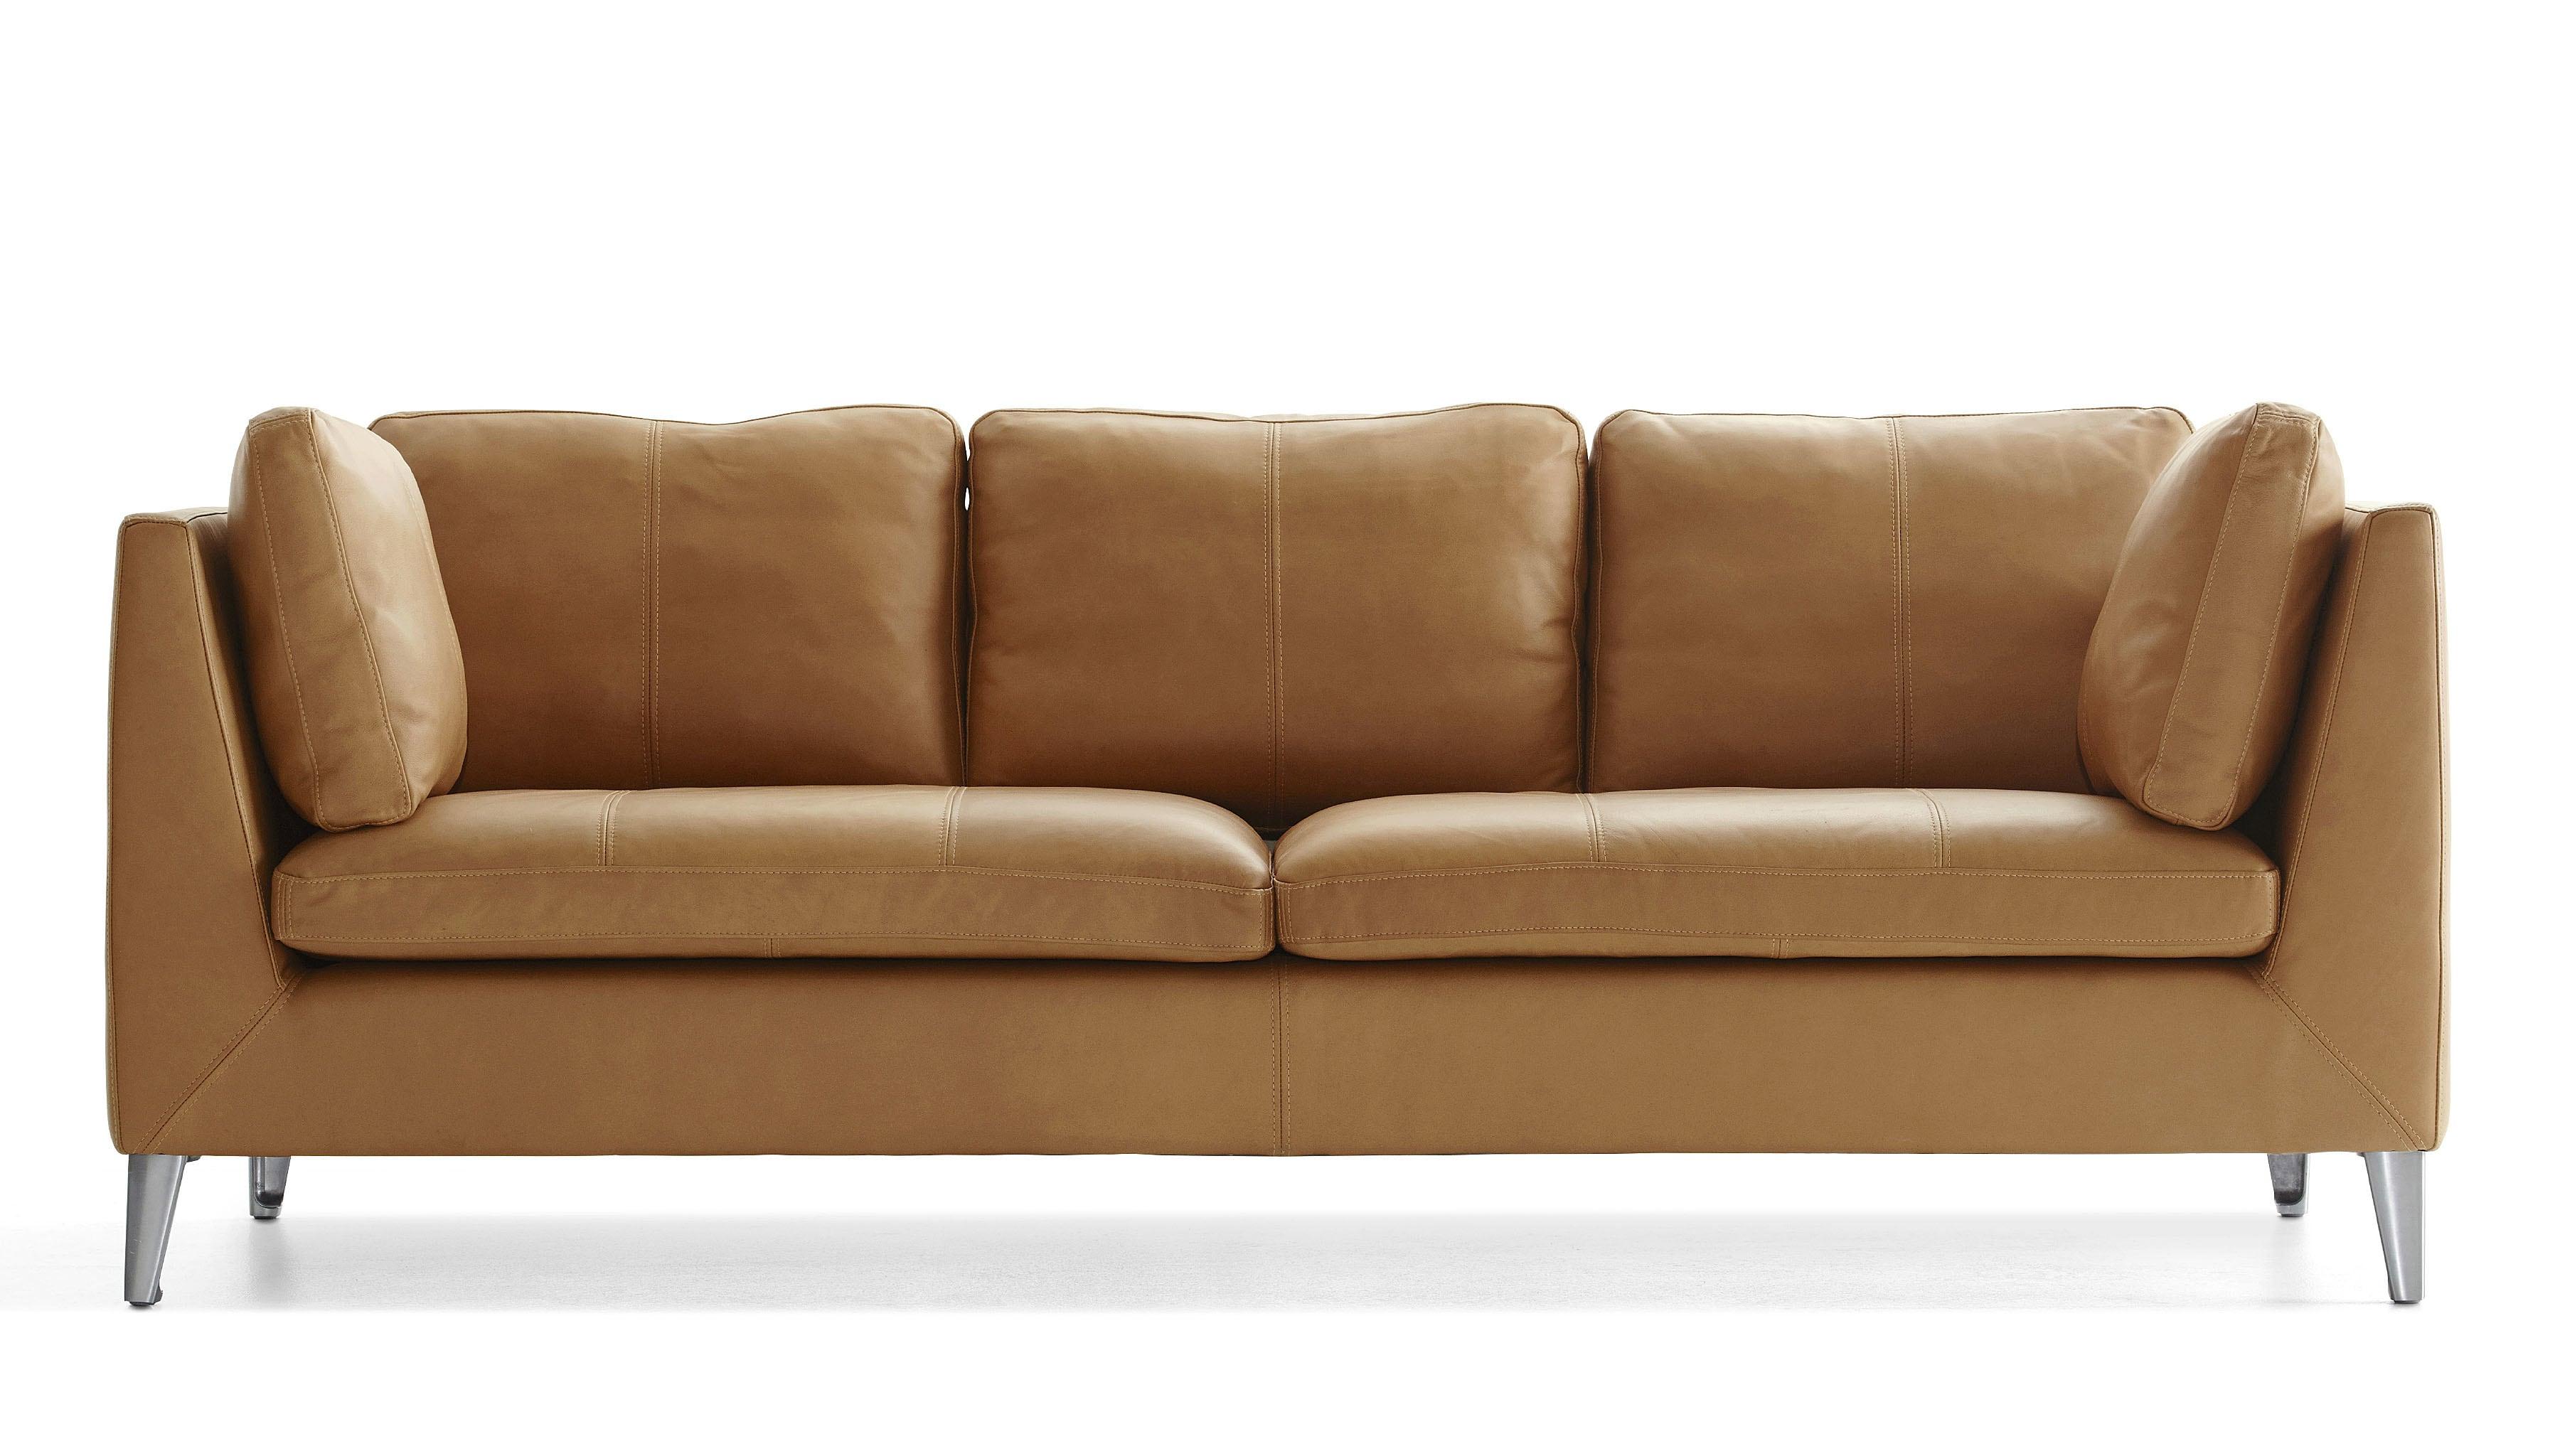 Sofas Muy Baratos X8d1 sofà S Y Sillones Pra Online Ikea